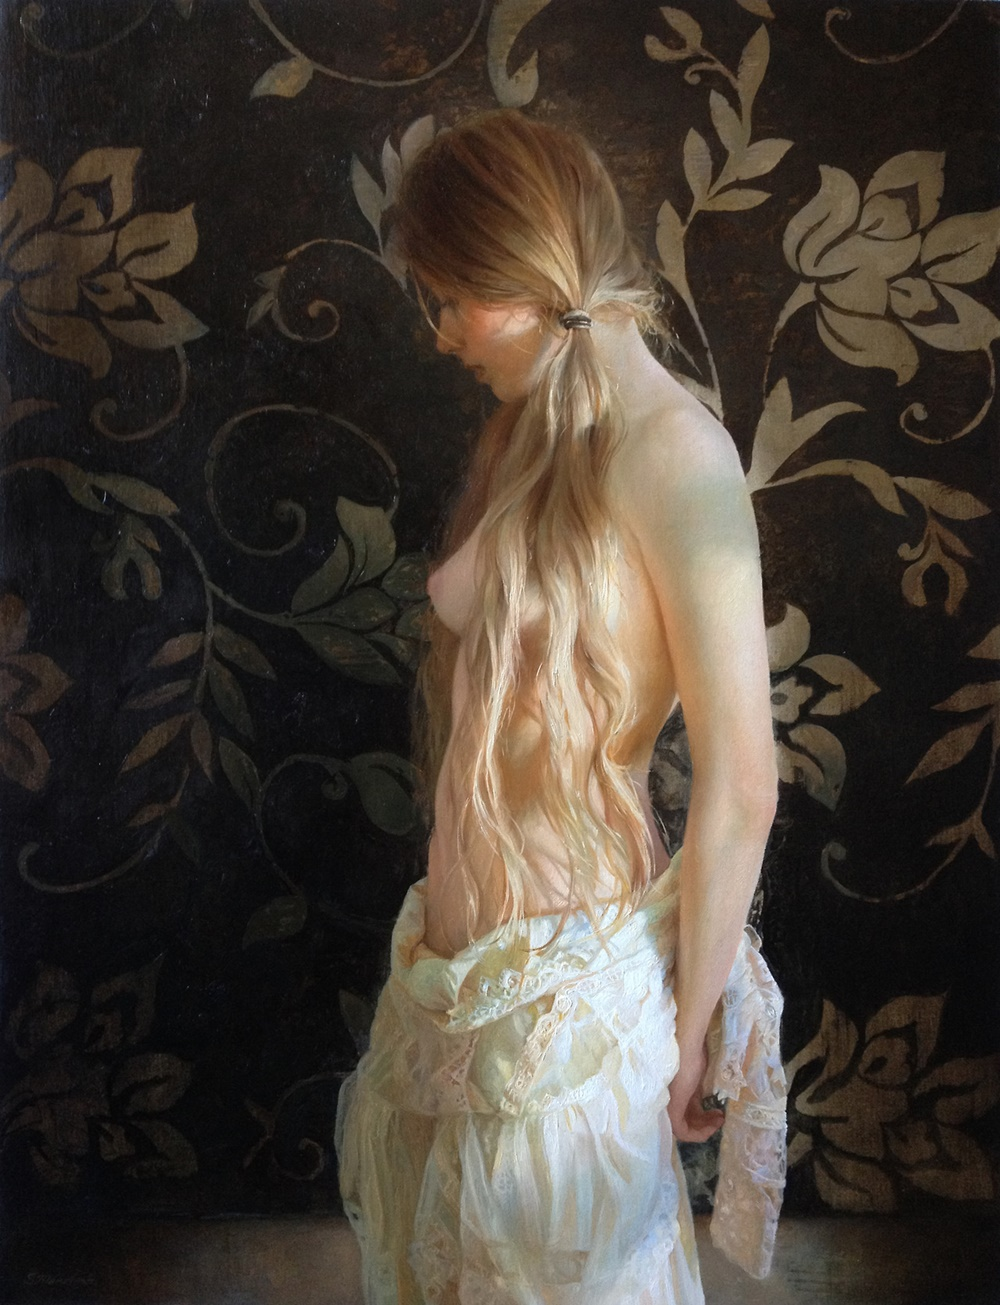 Women's images by a Russian realist artist Sergey Marshennikov - 31